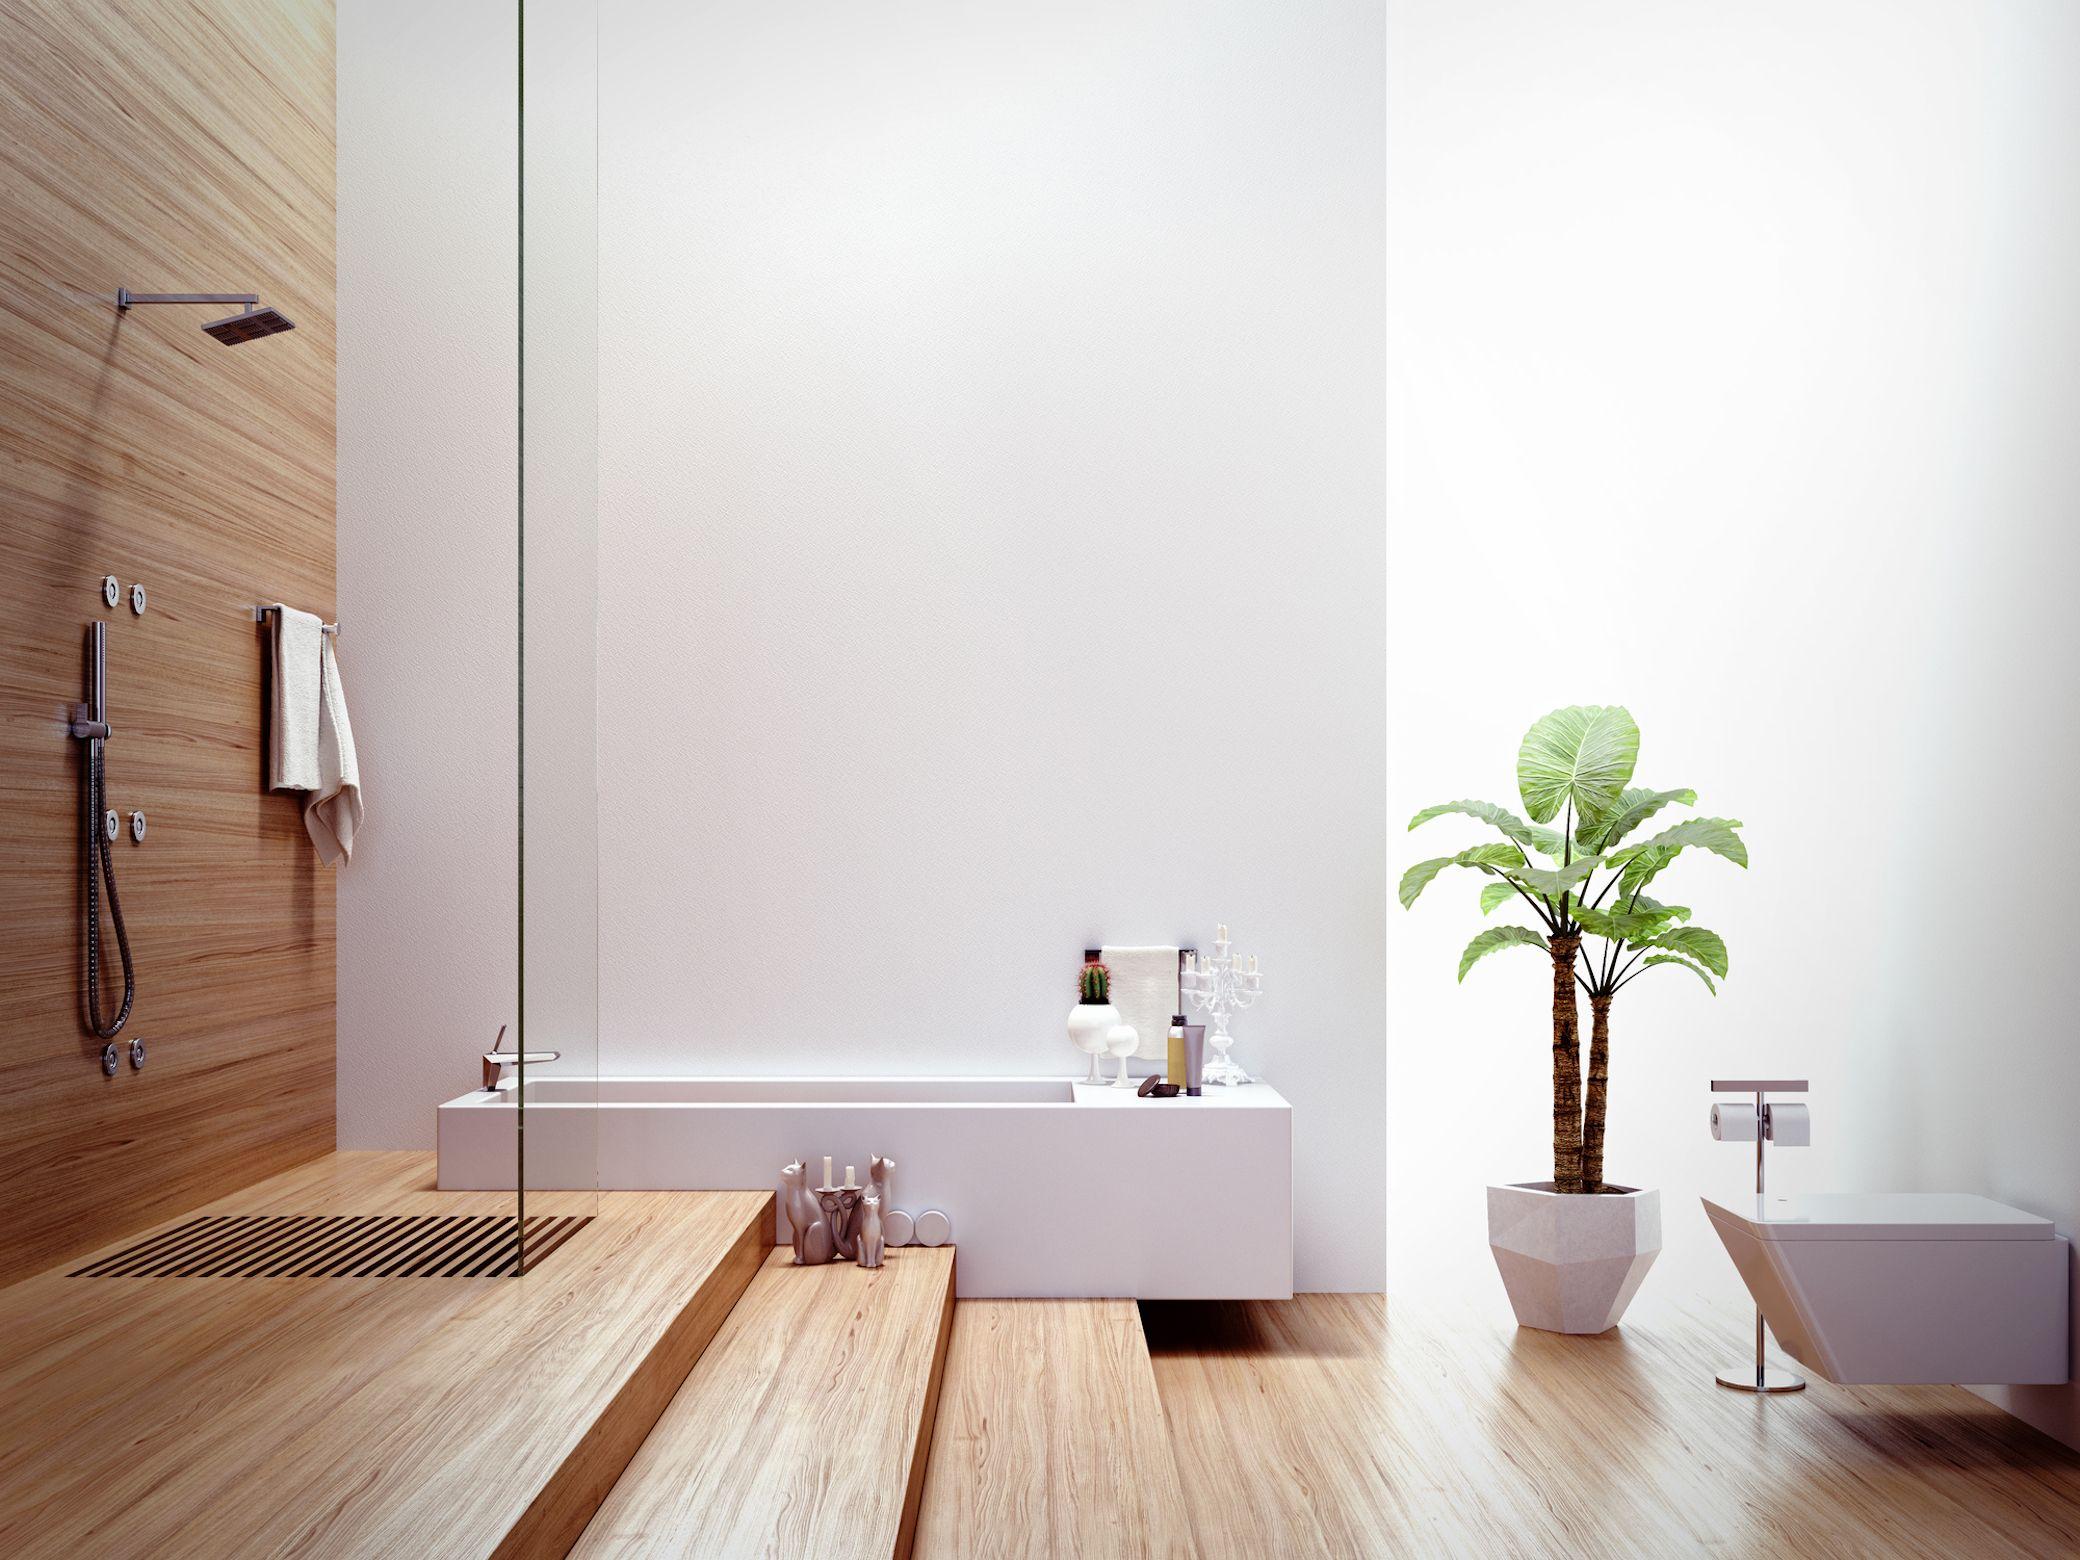 3 Alternativen Zur Fliese Im Badezimmer Top Bathroom Design Showers Without Doors Beautiful Bathroom Designs